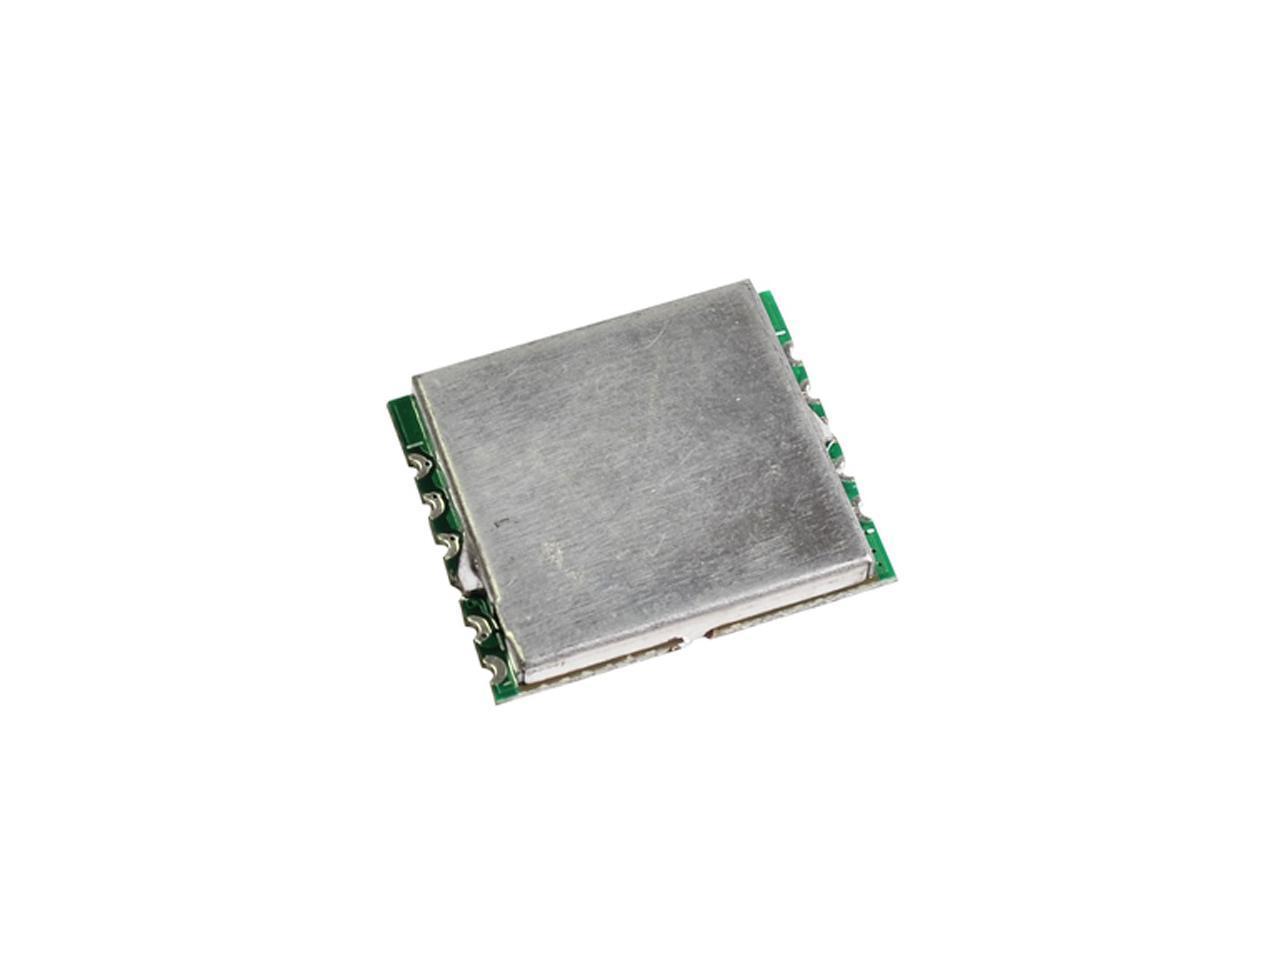 Boscam FPV 5.8G 200mW Wireless Audio Video Transmitter Module TX5823 NEW